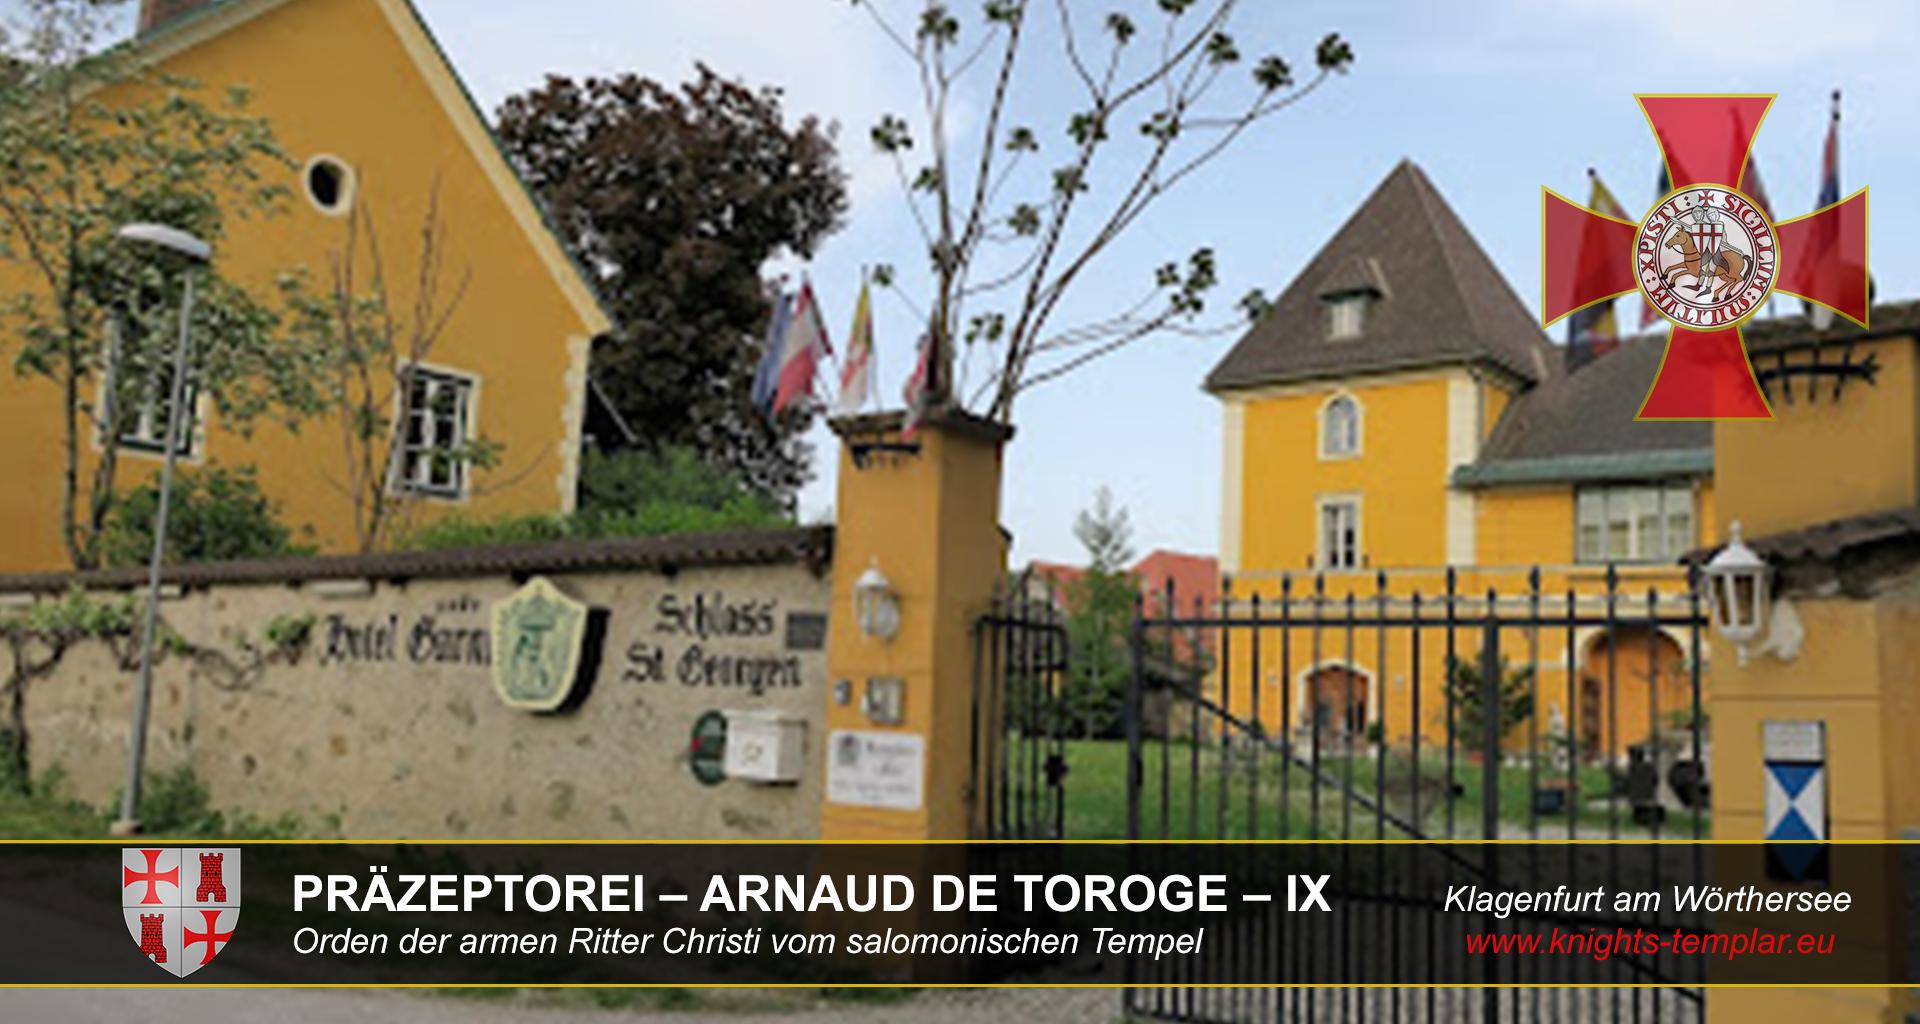 PRÄZEPTOREI – ARNAUD DE TOROGE – IX Klagenfurt am Wörthersee